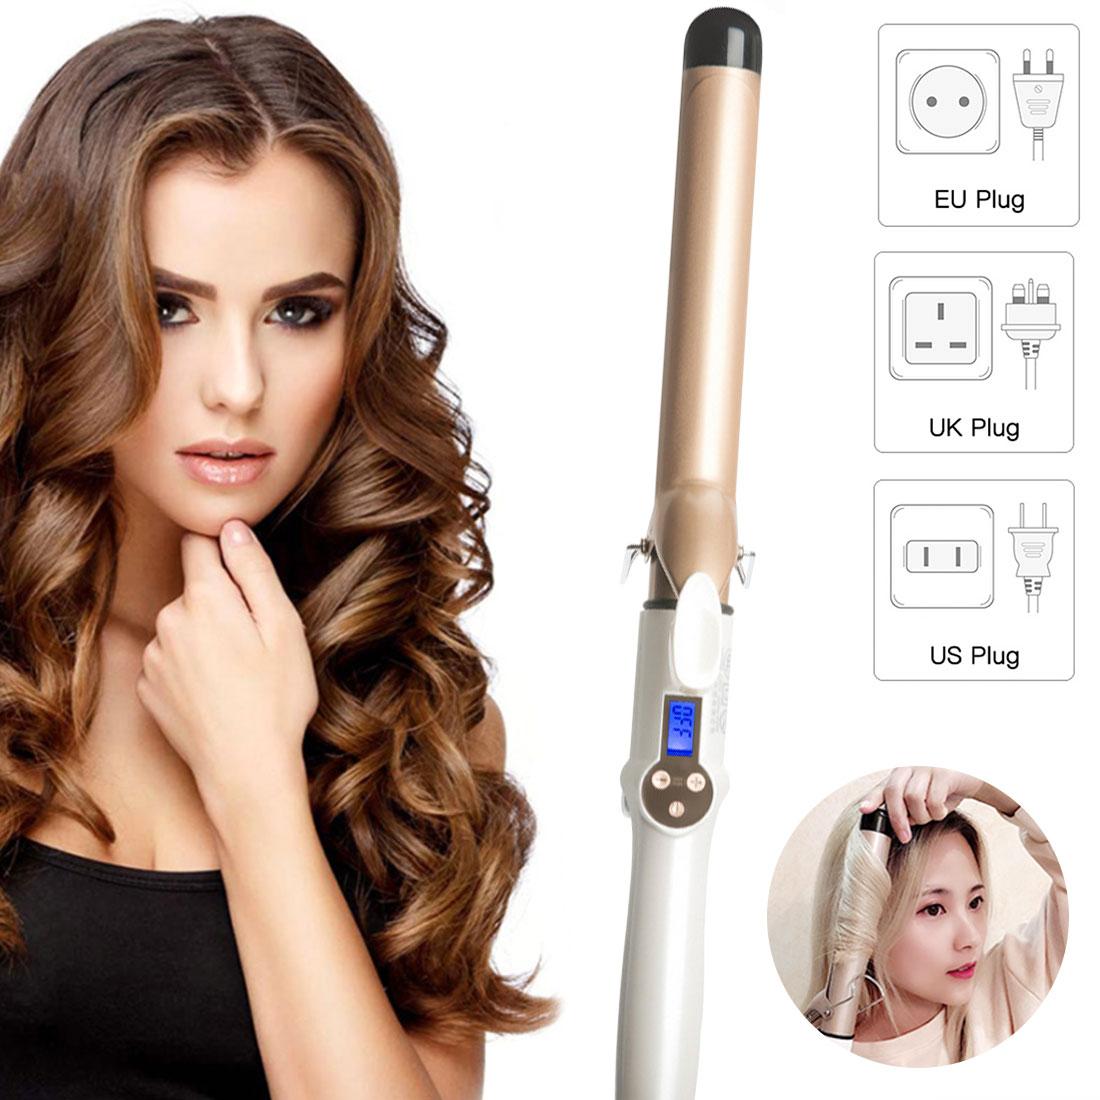 ferro de ondulacao ceramica eletrica modelador de cabelo profissional lcd estilo